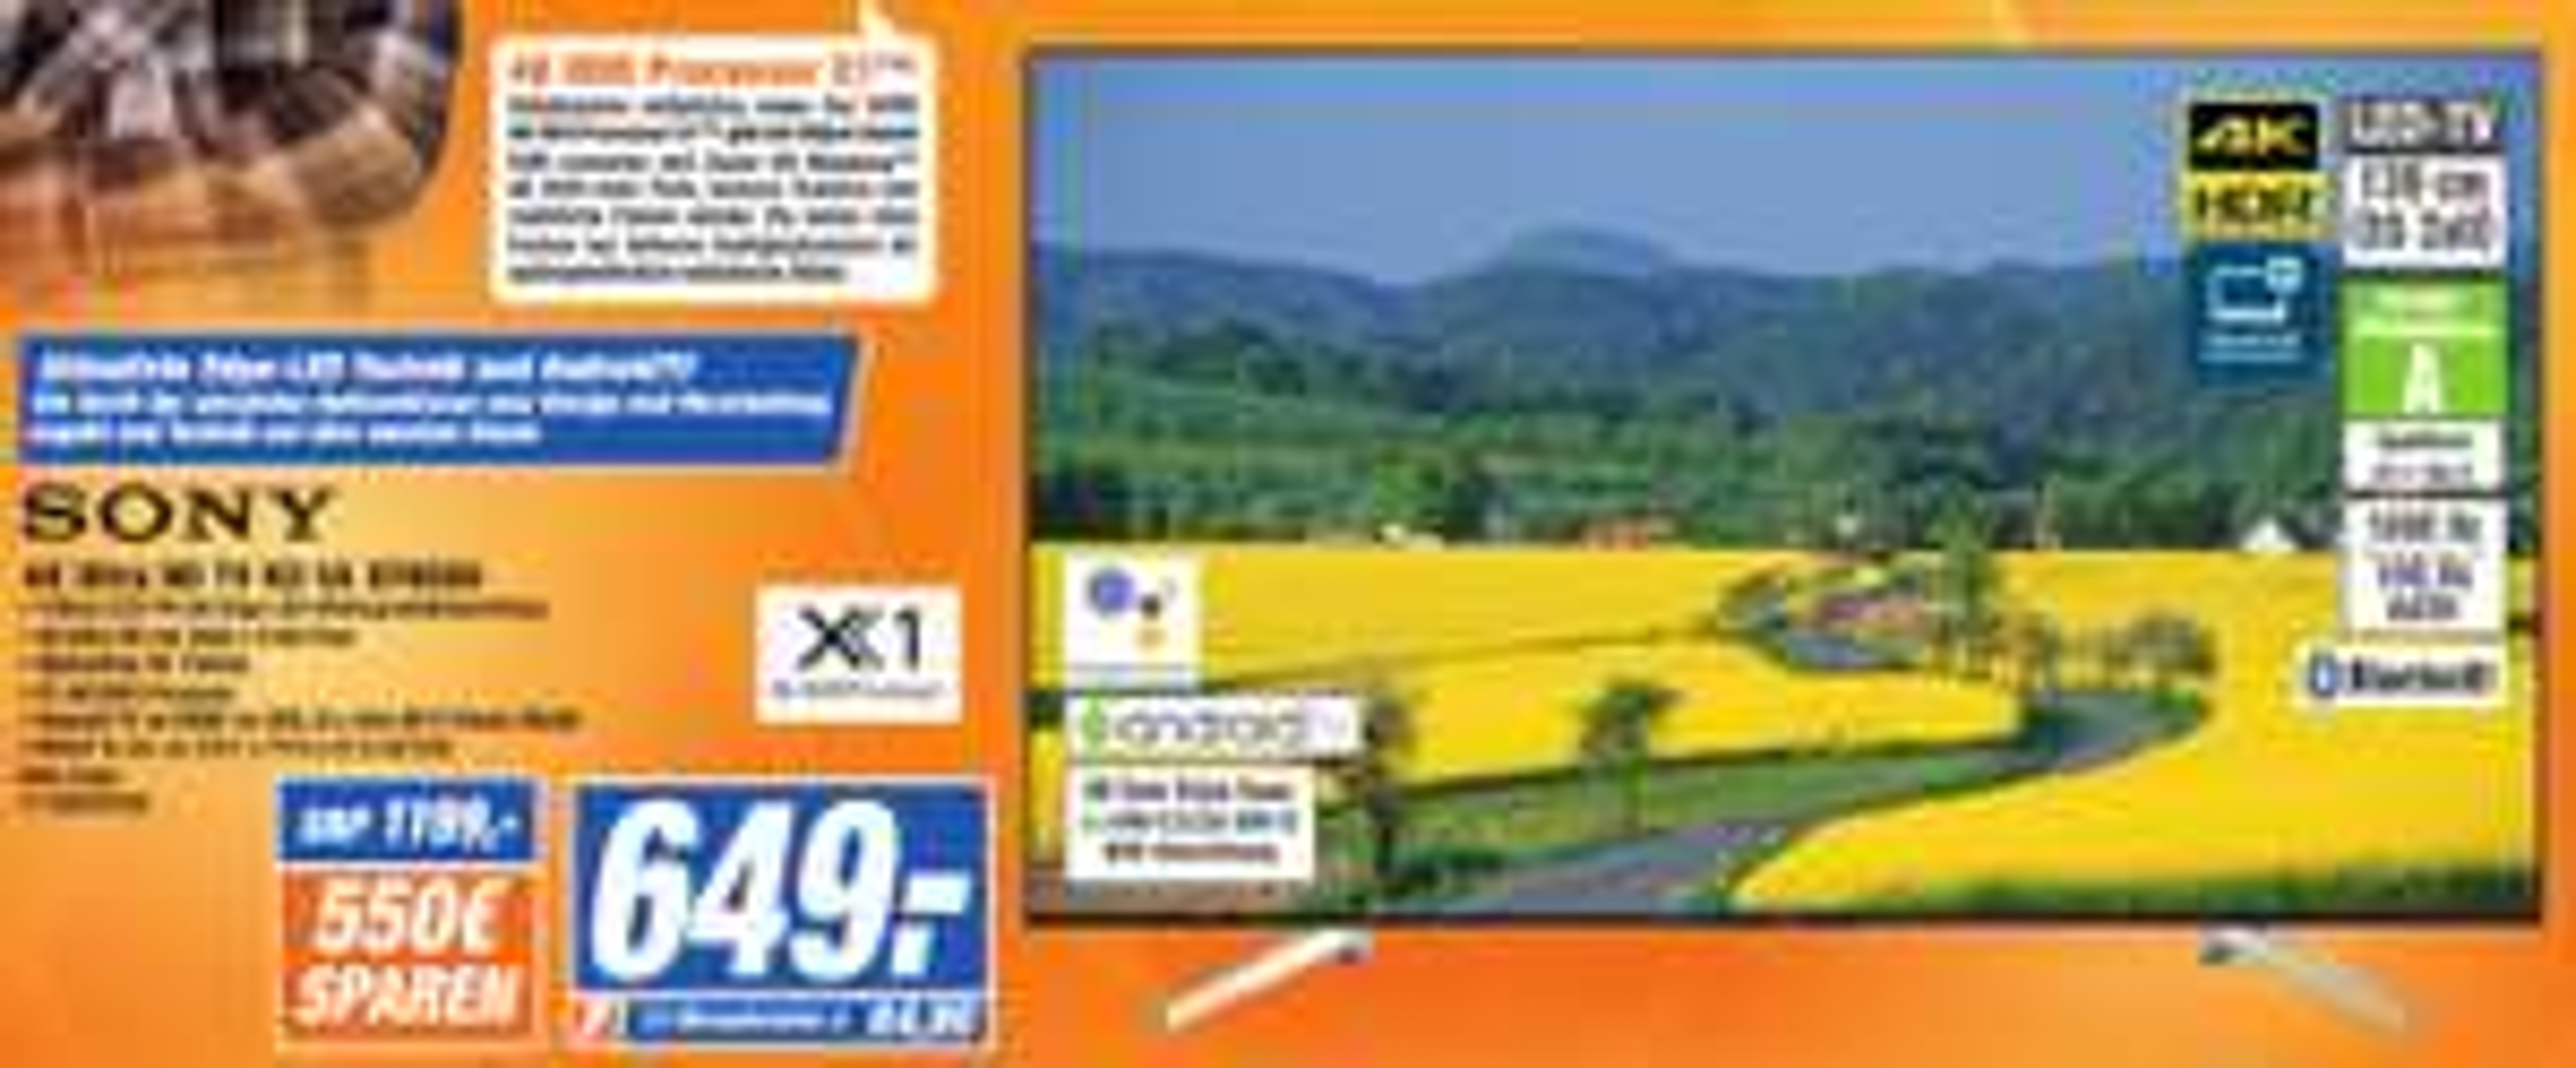 (Lokal) SONY KD-55XF8505 LED TV (Flat, 55 Zoll/139 cm, UHD 4K, SMART TV, Android TV)